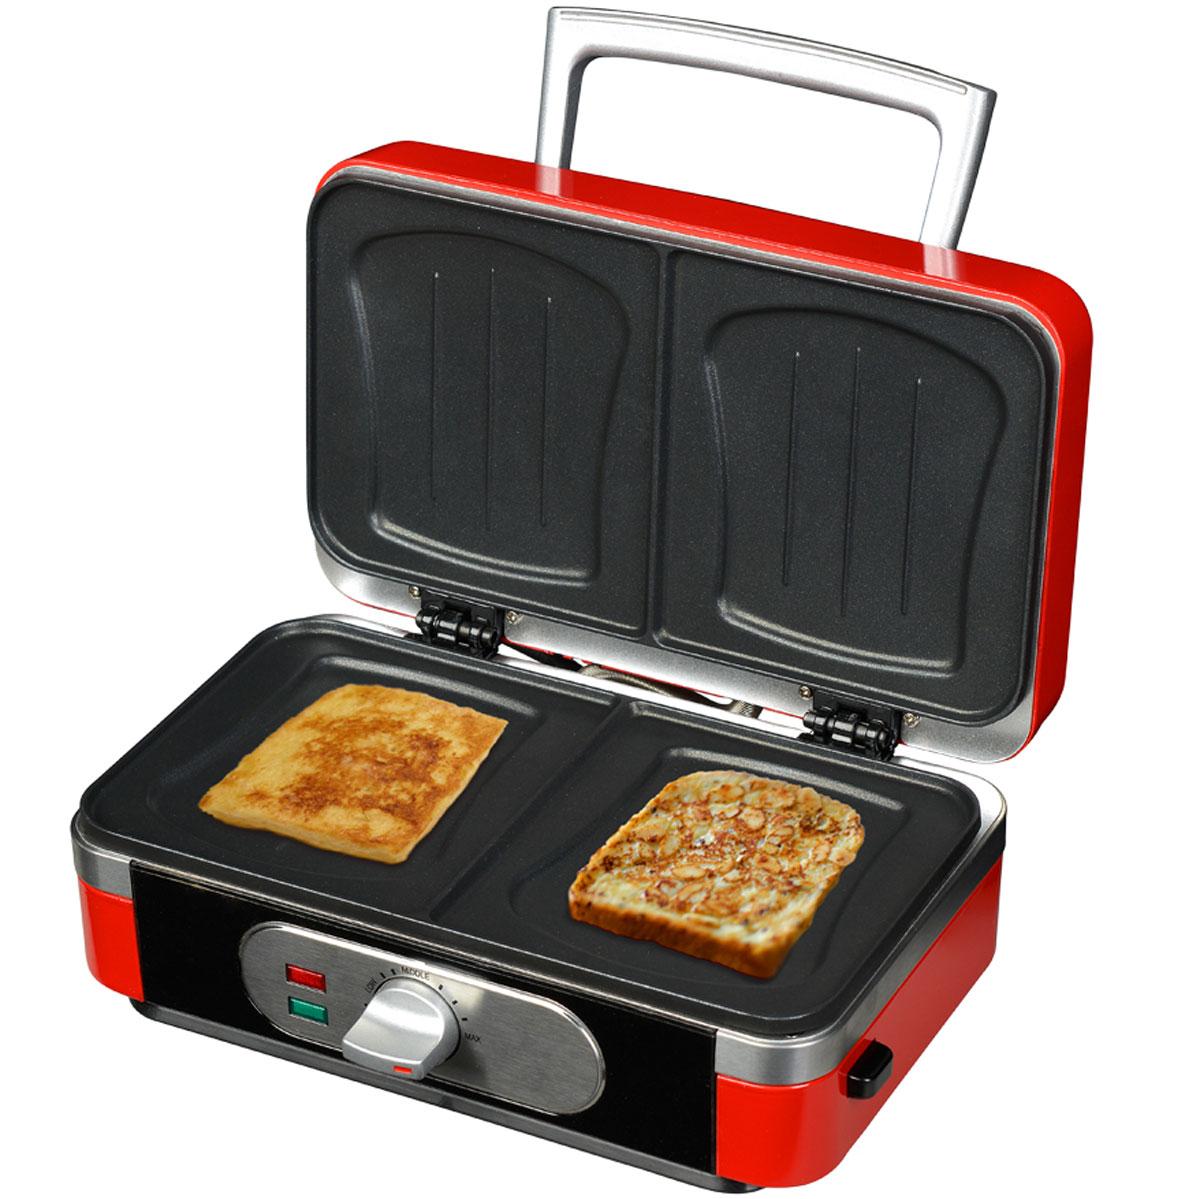 GFgril GF-040 Waffle-Grill-Toast, Red вафельница 3 в 1